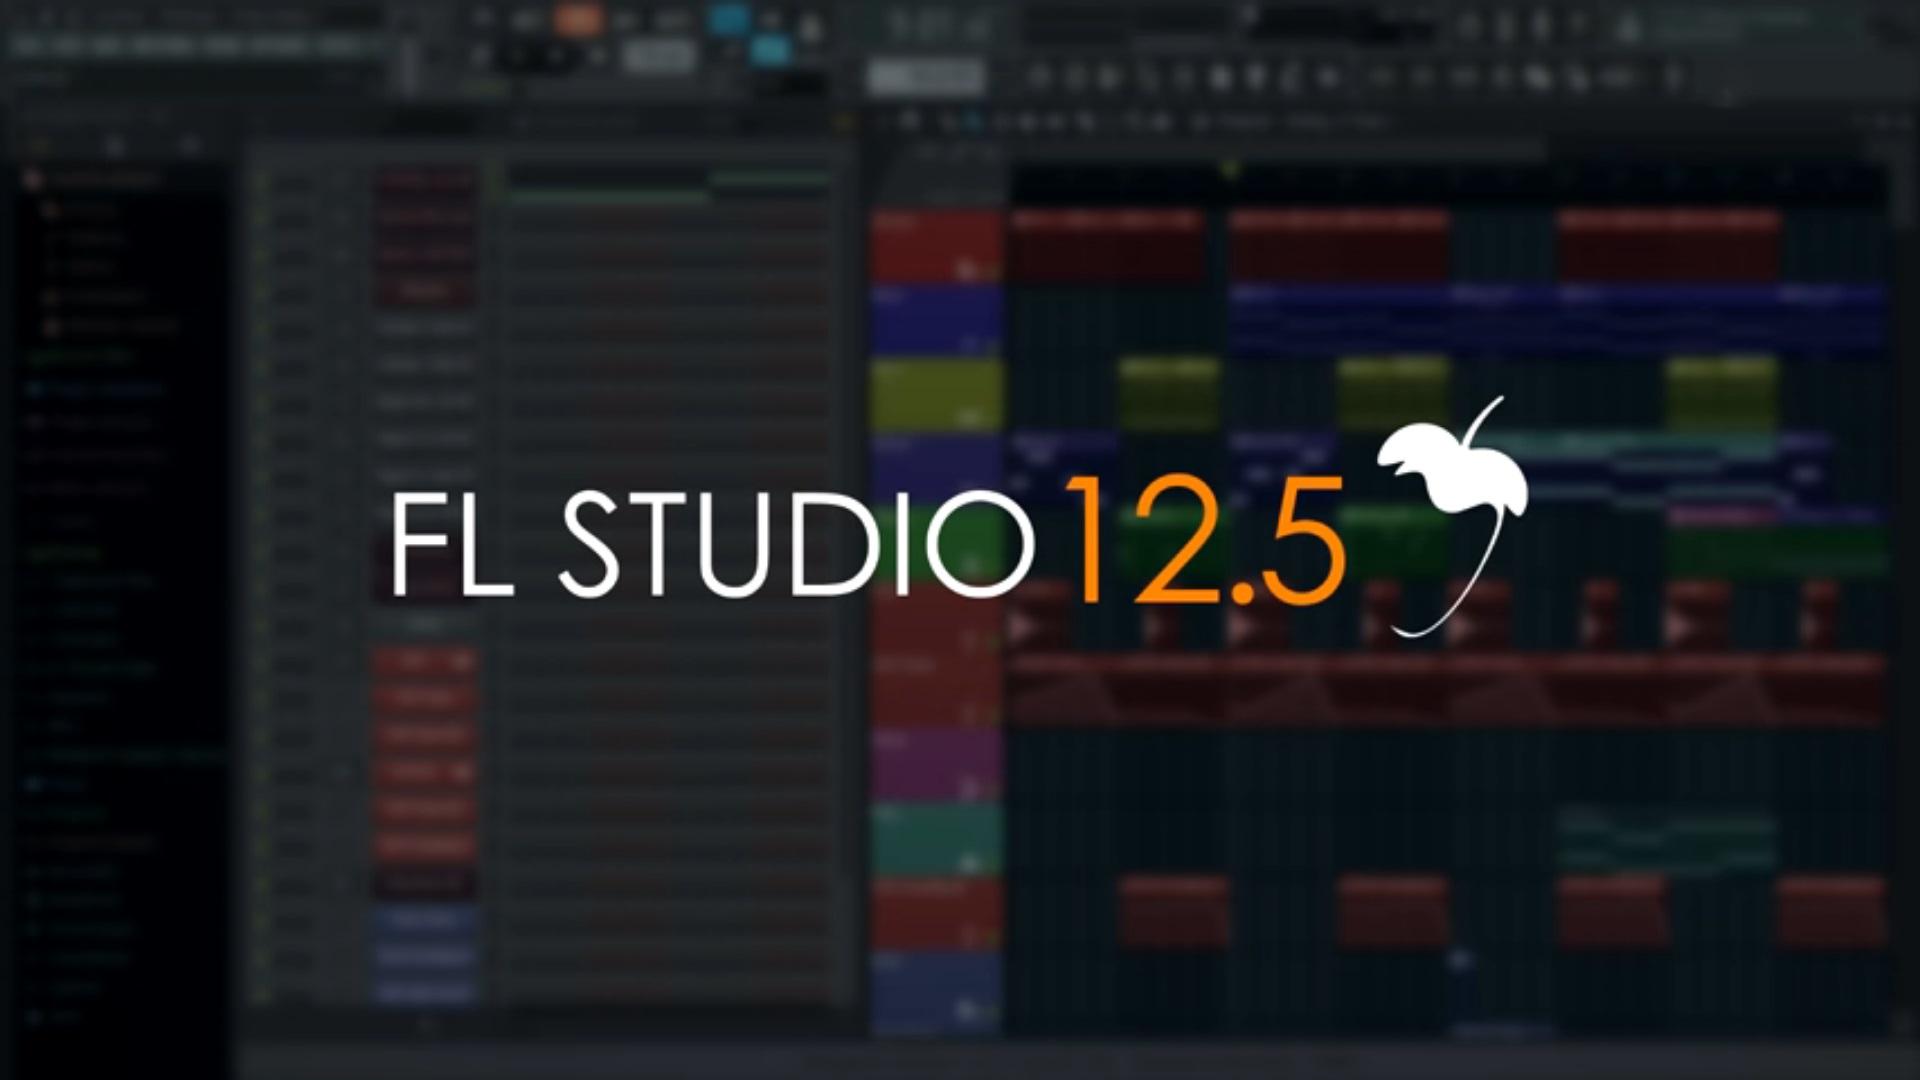 crack fl studio 12.5 chomikuj